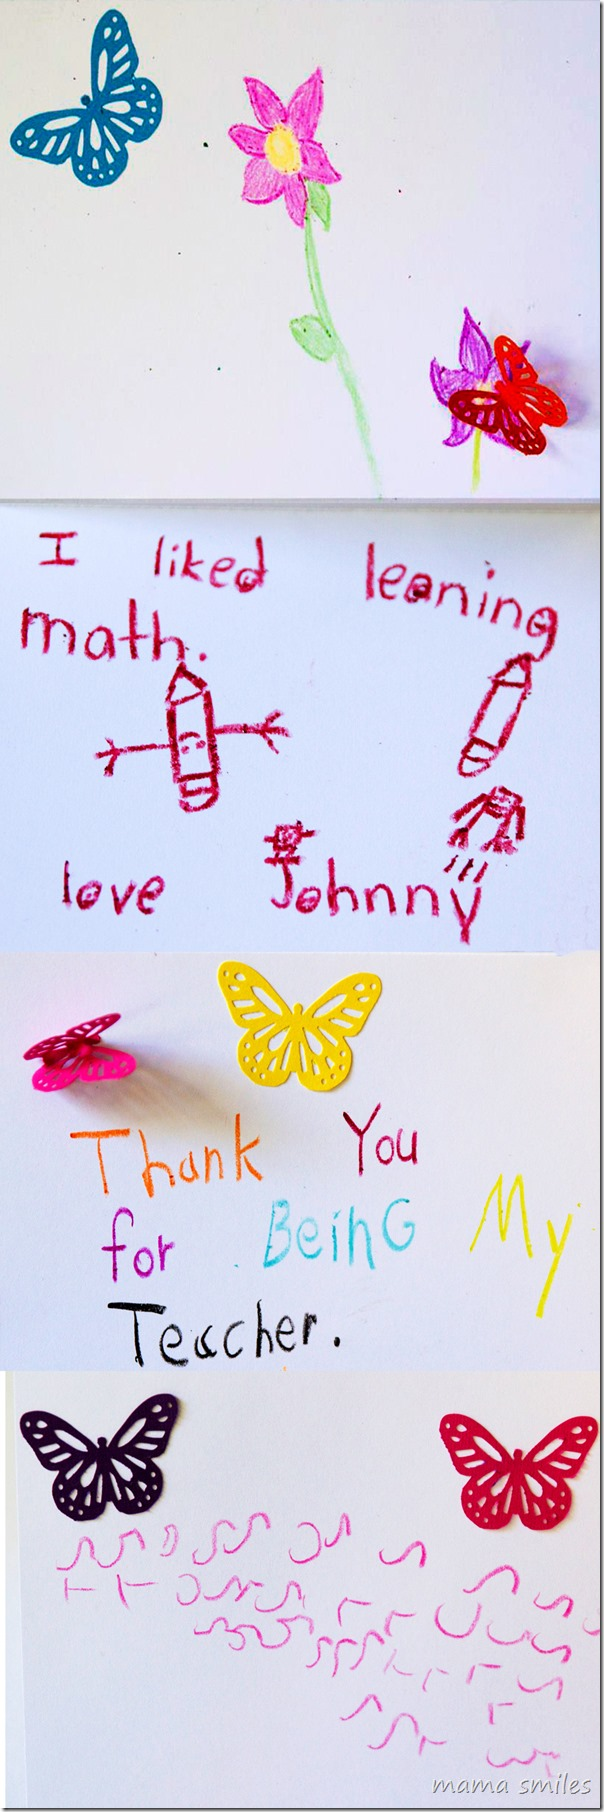 Popular Kids To Make Teacher Thank You Cards Teacher Thank You Cards Teachers Pinterest Thank You Cards Kids To Make Mama Smiles Thank You Cards Teachers To Make